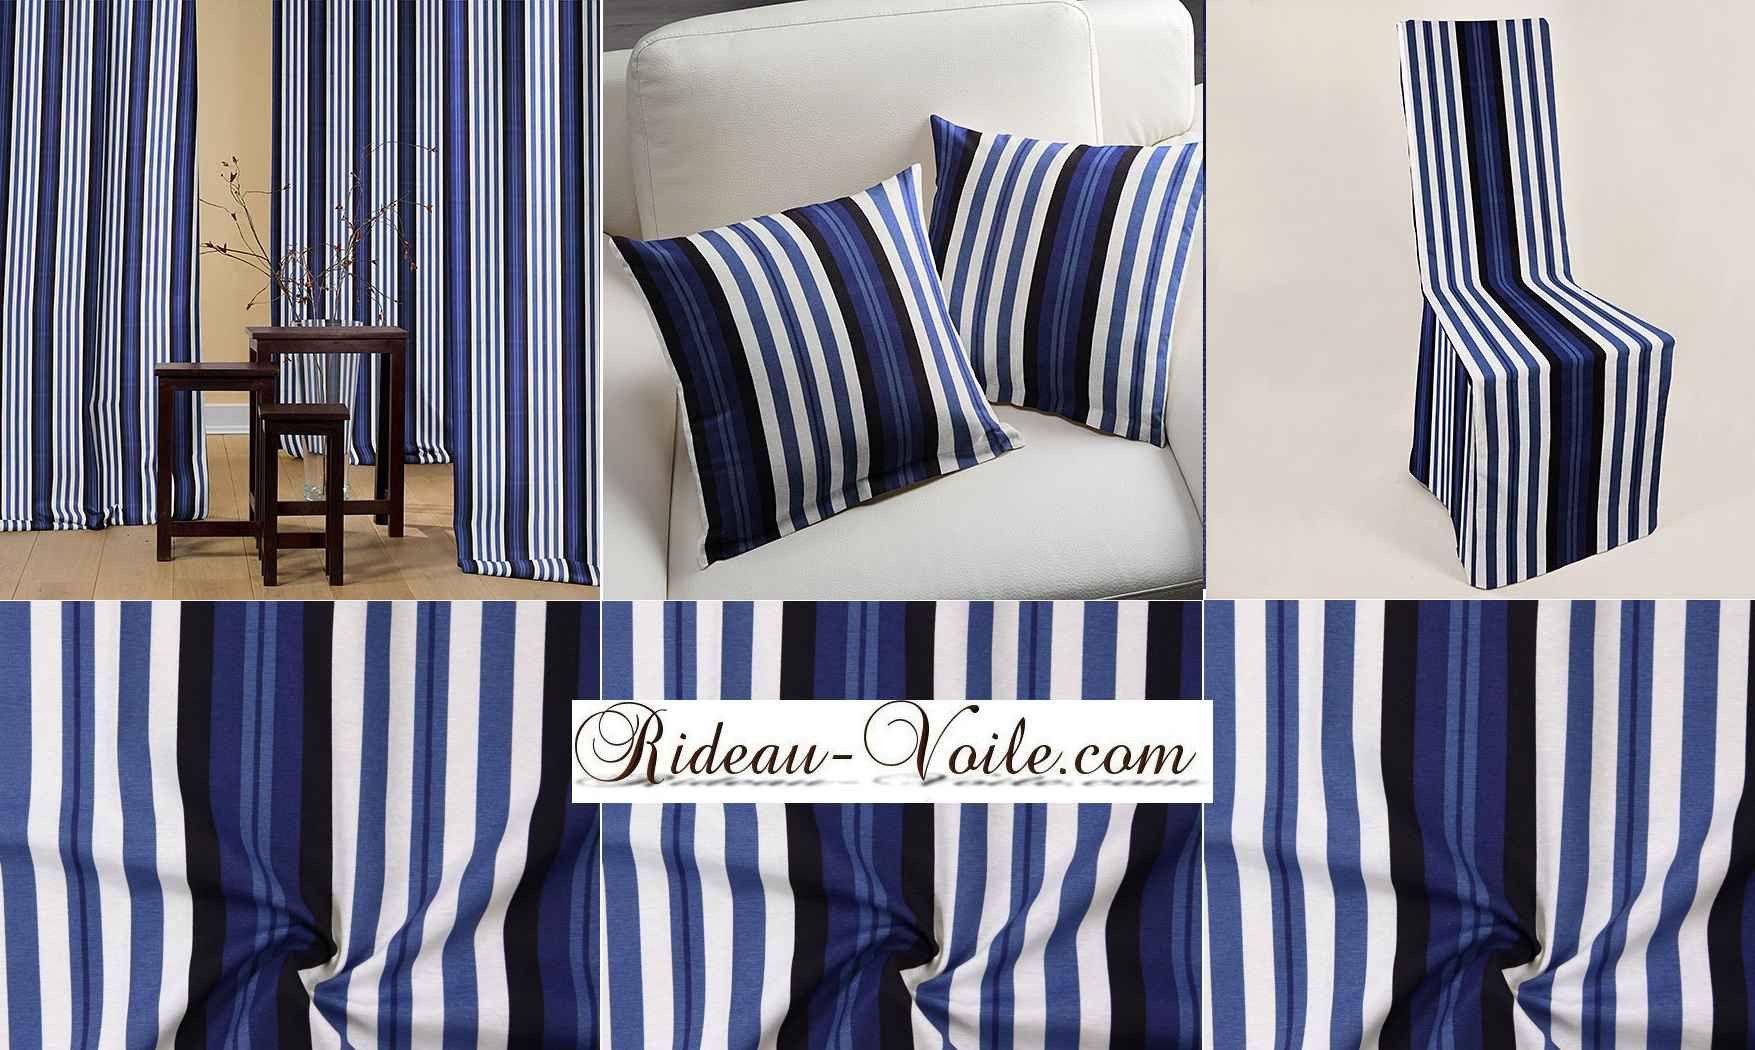 tissu imprim motif exotique tropical d coration rideau. Black Bedroom Furniture Sets. Home Design Ideas